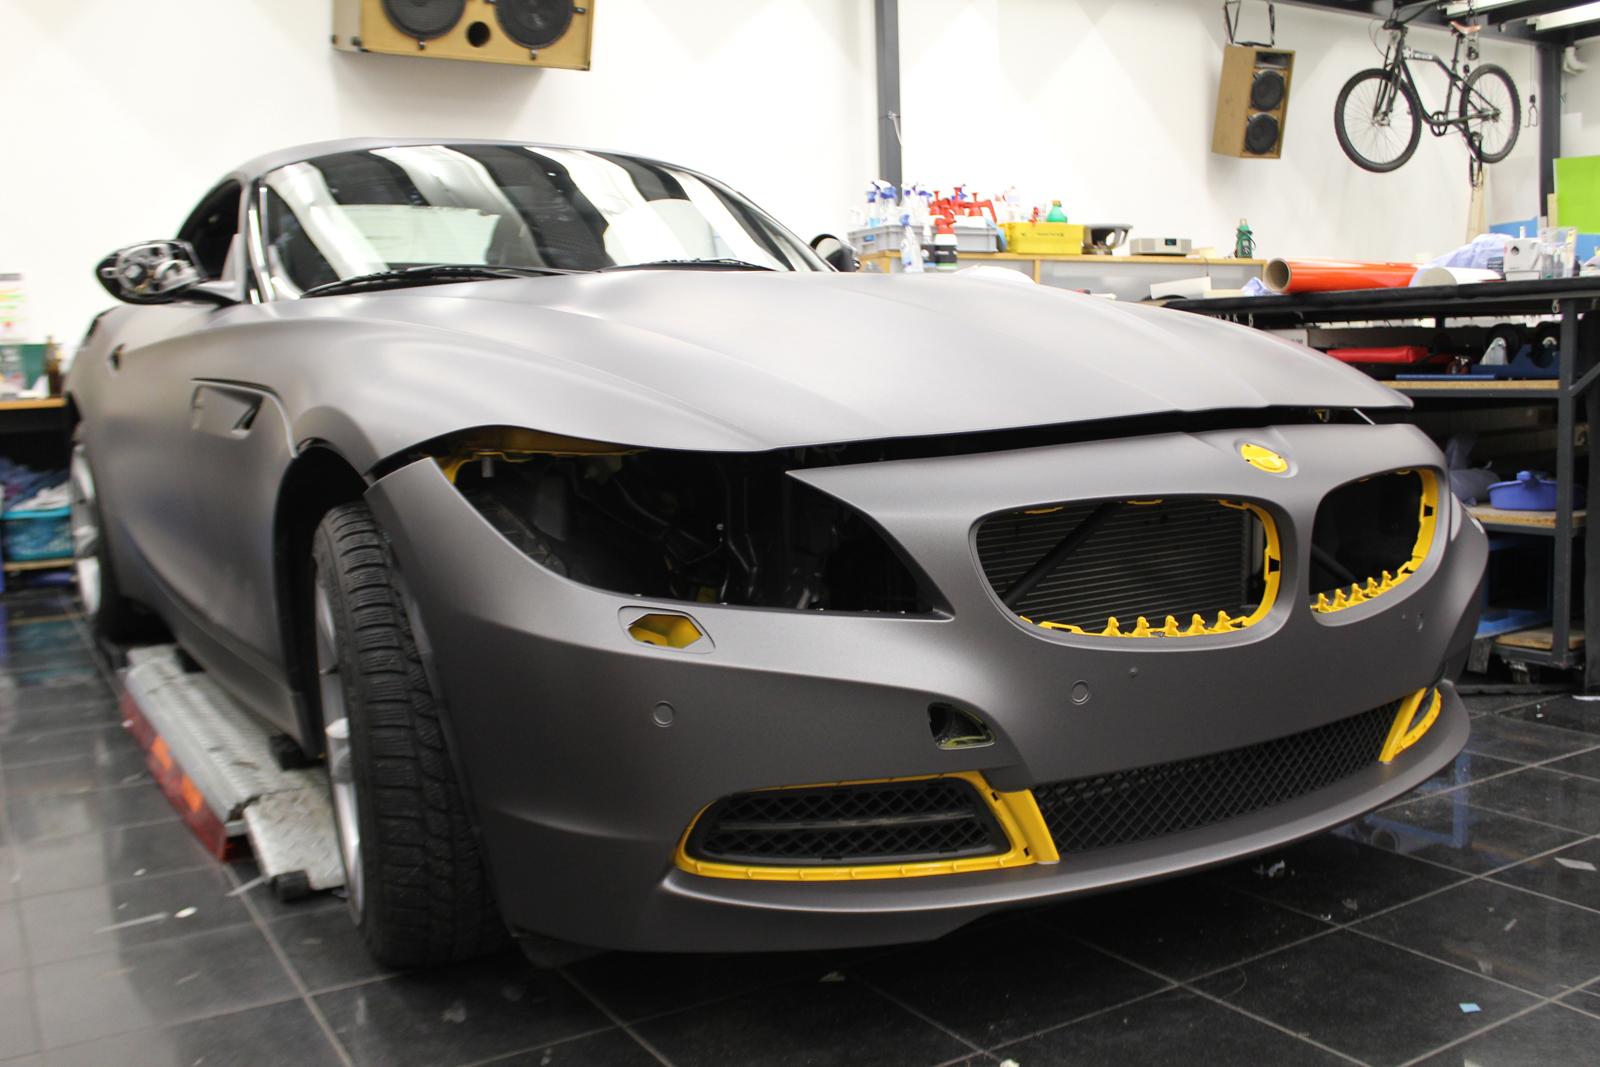 BMW_Z4_FOLIERUNG_ANTHRAZIT_METALLIC_MATT_02